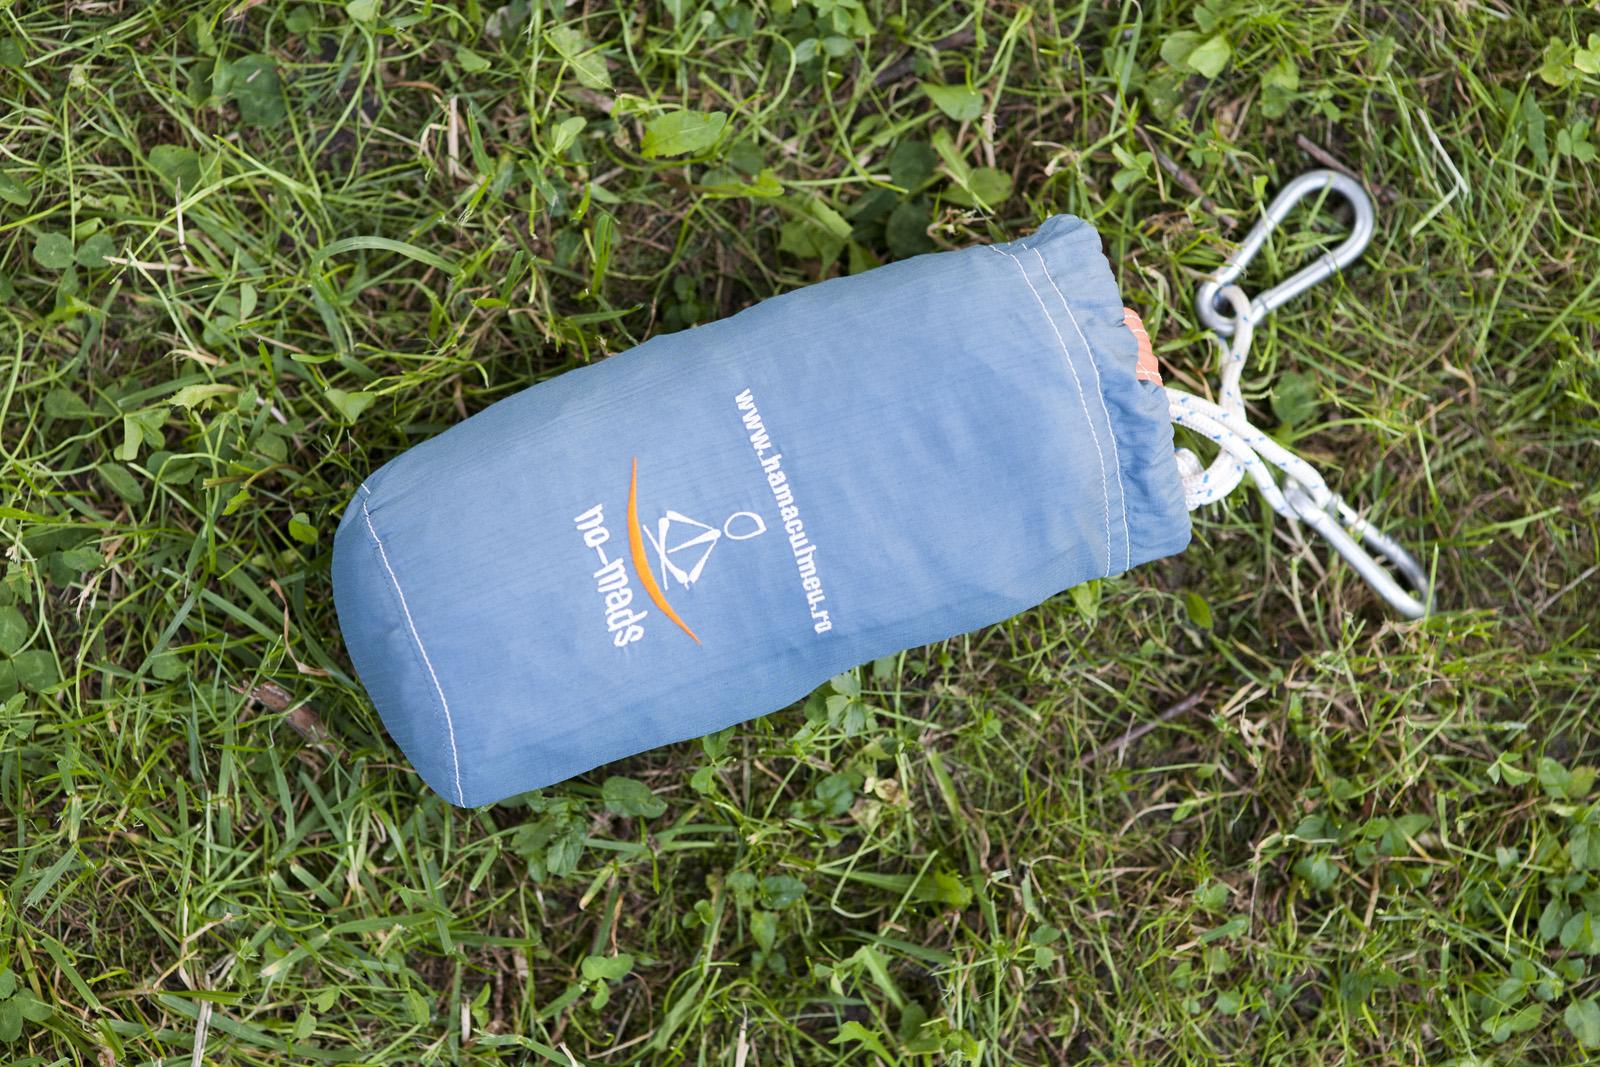 hamac ripstop blue-orange saculet